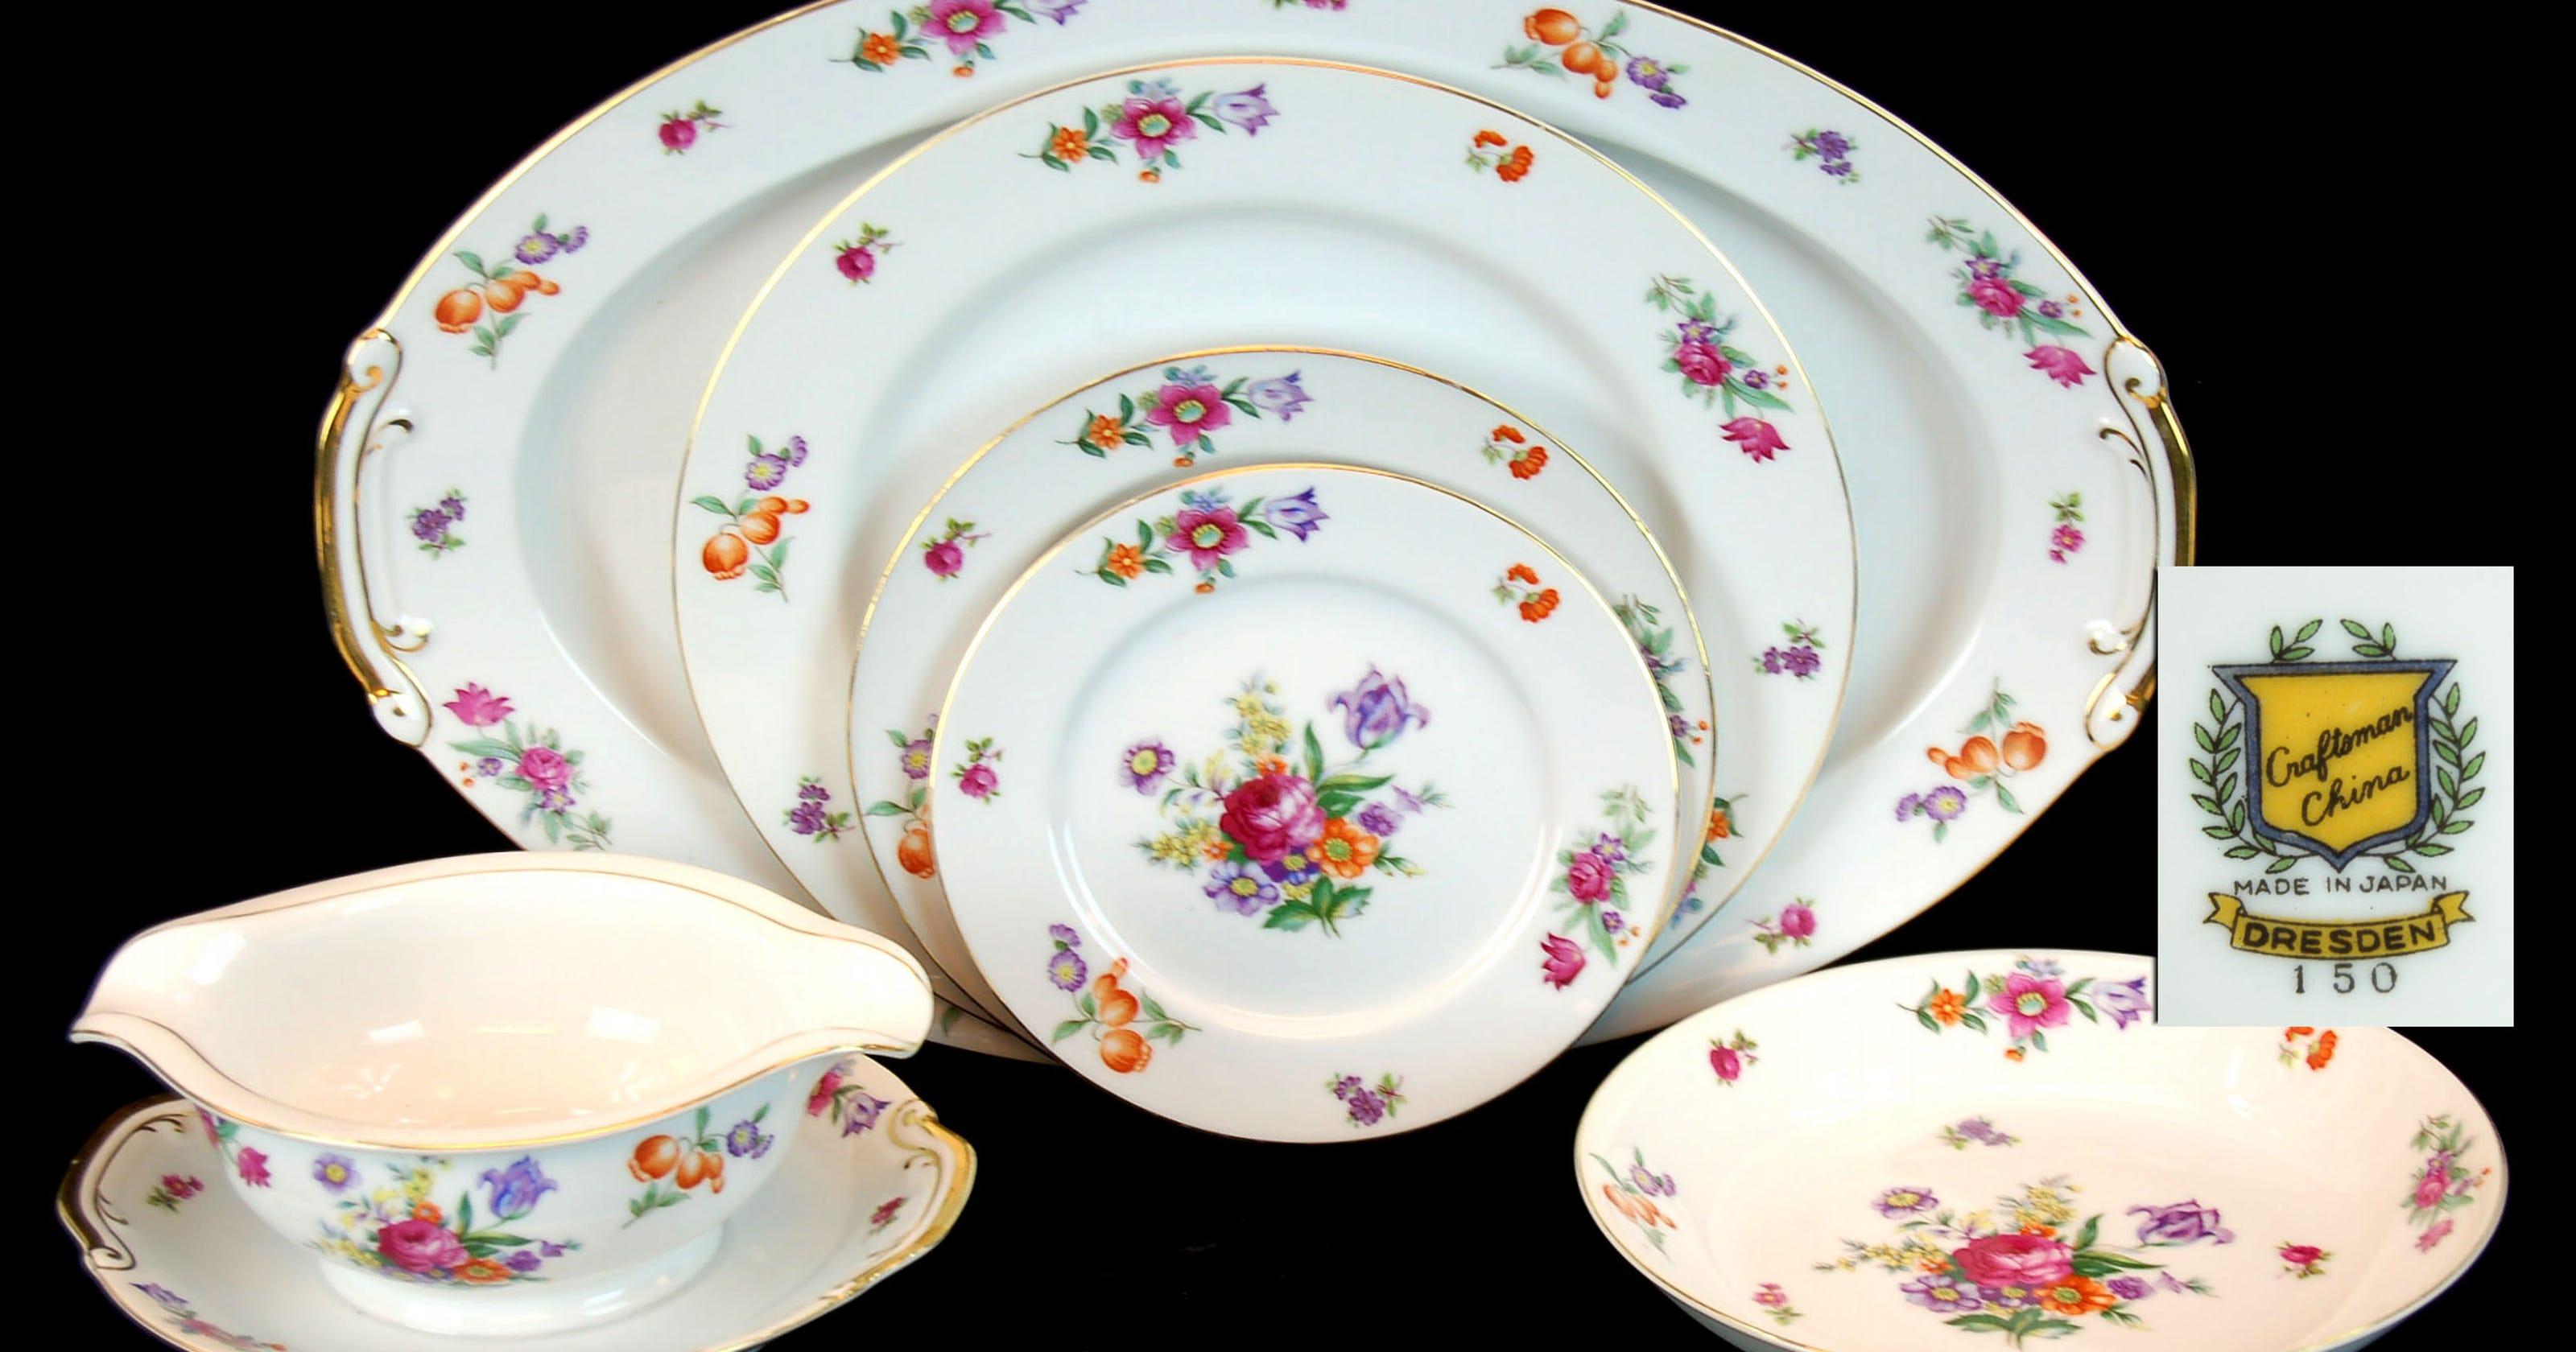 Collectors: Should you hang on to mom's china set?